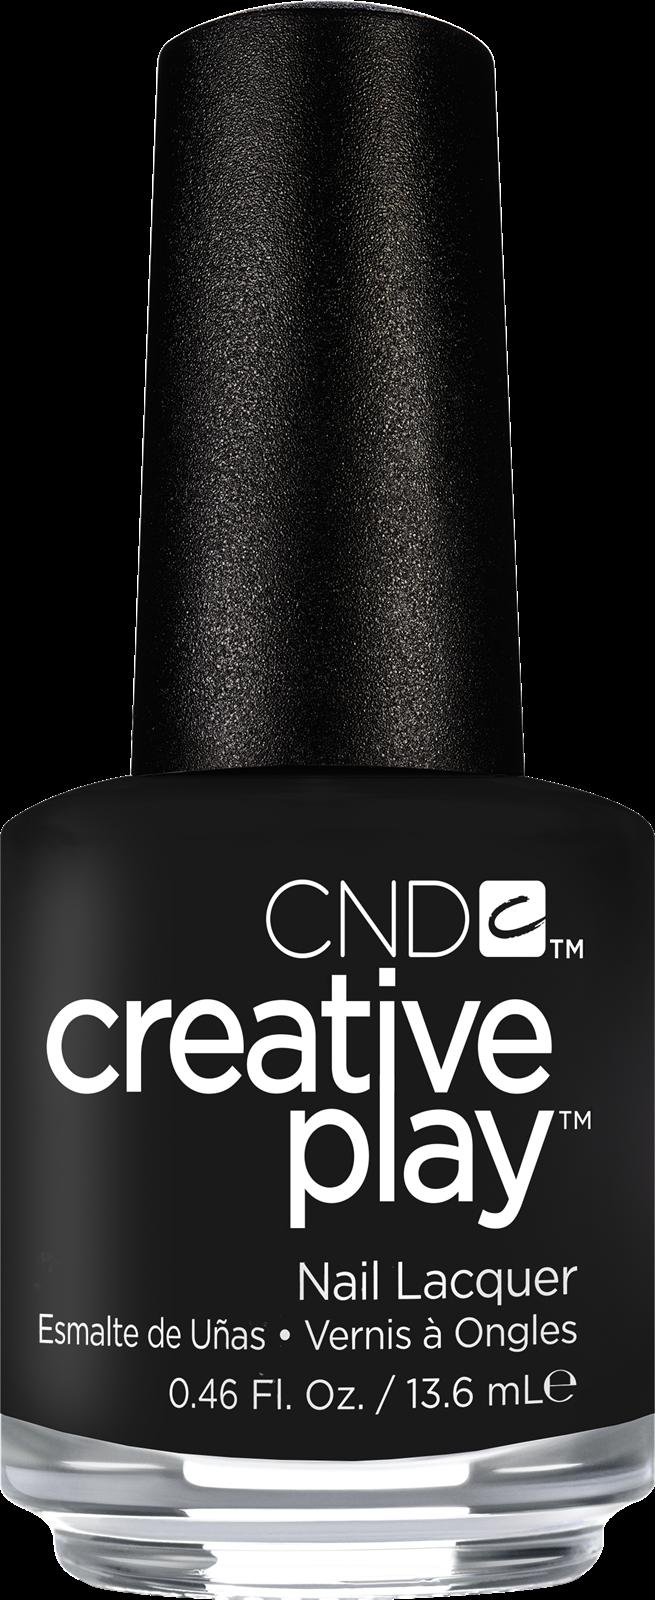 Afbeelding van CND ™ Creative Play Black Forth